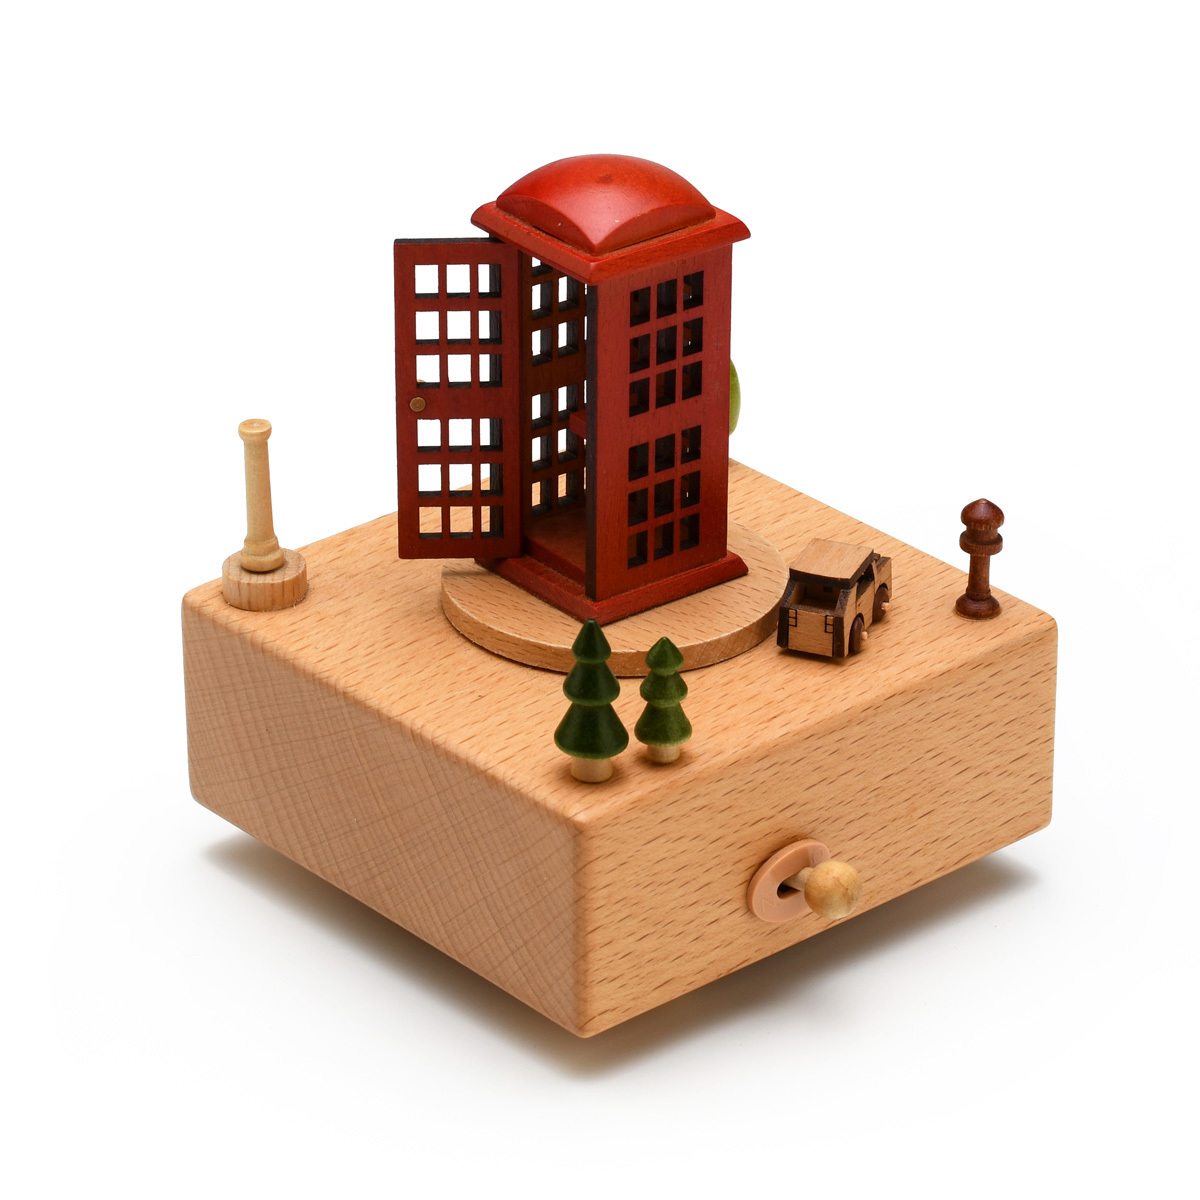 Animated 18 Note Musical Wooden Iconic Red Telephone Box Keepsake